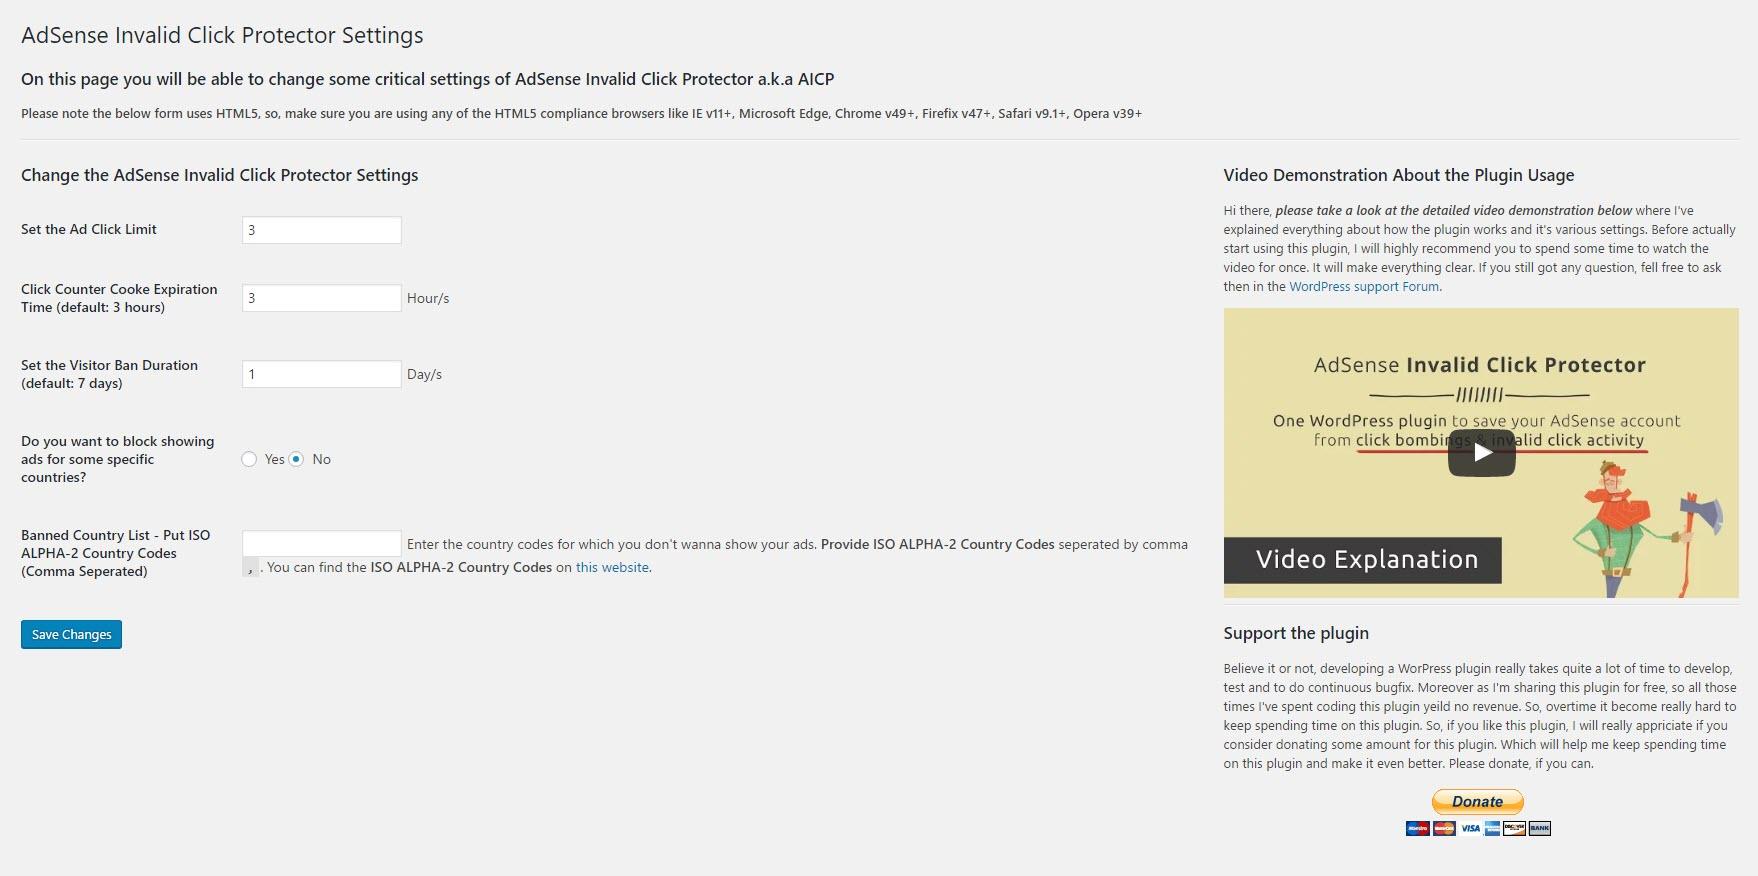 AICP - General Settings Page Screenshot